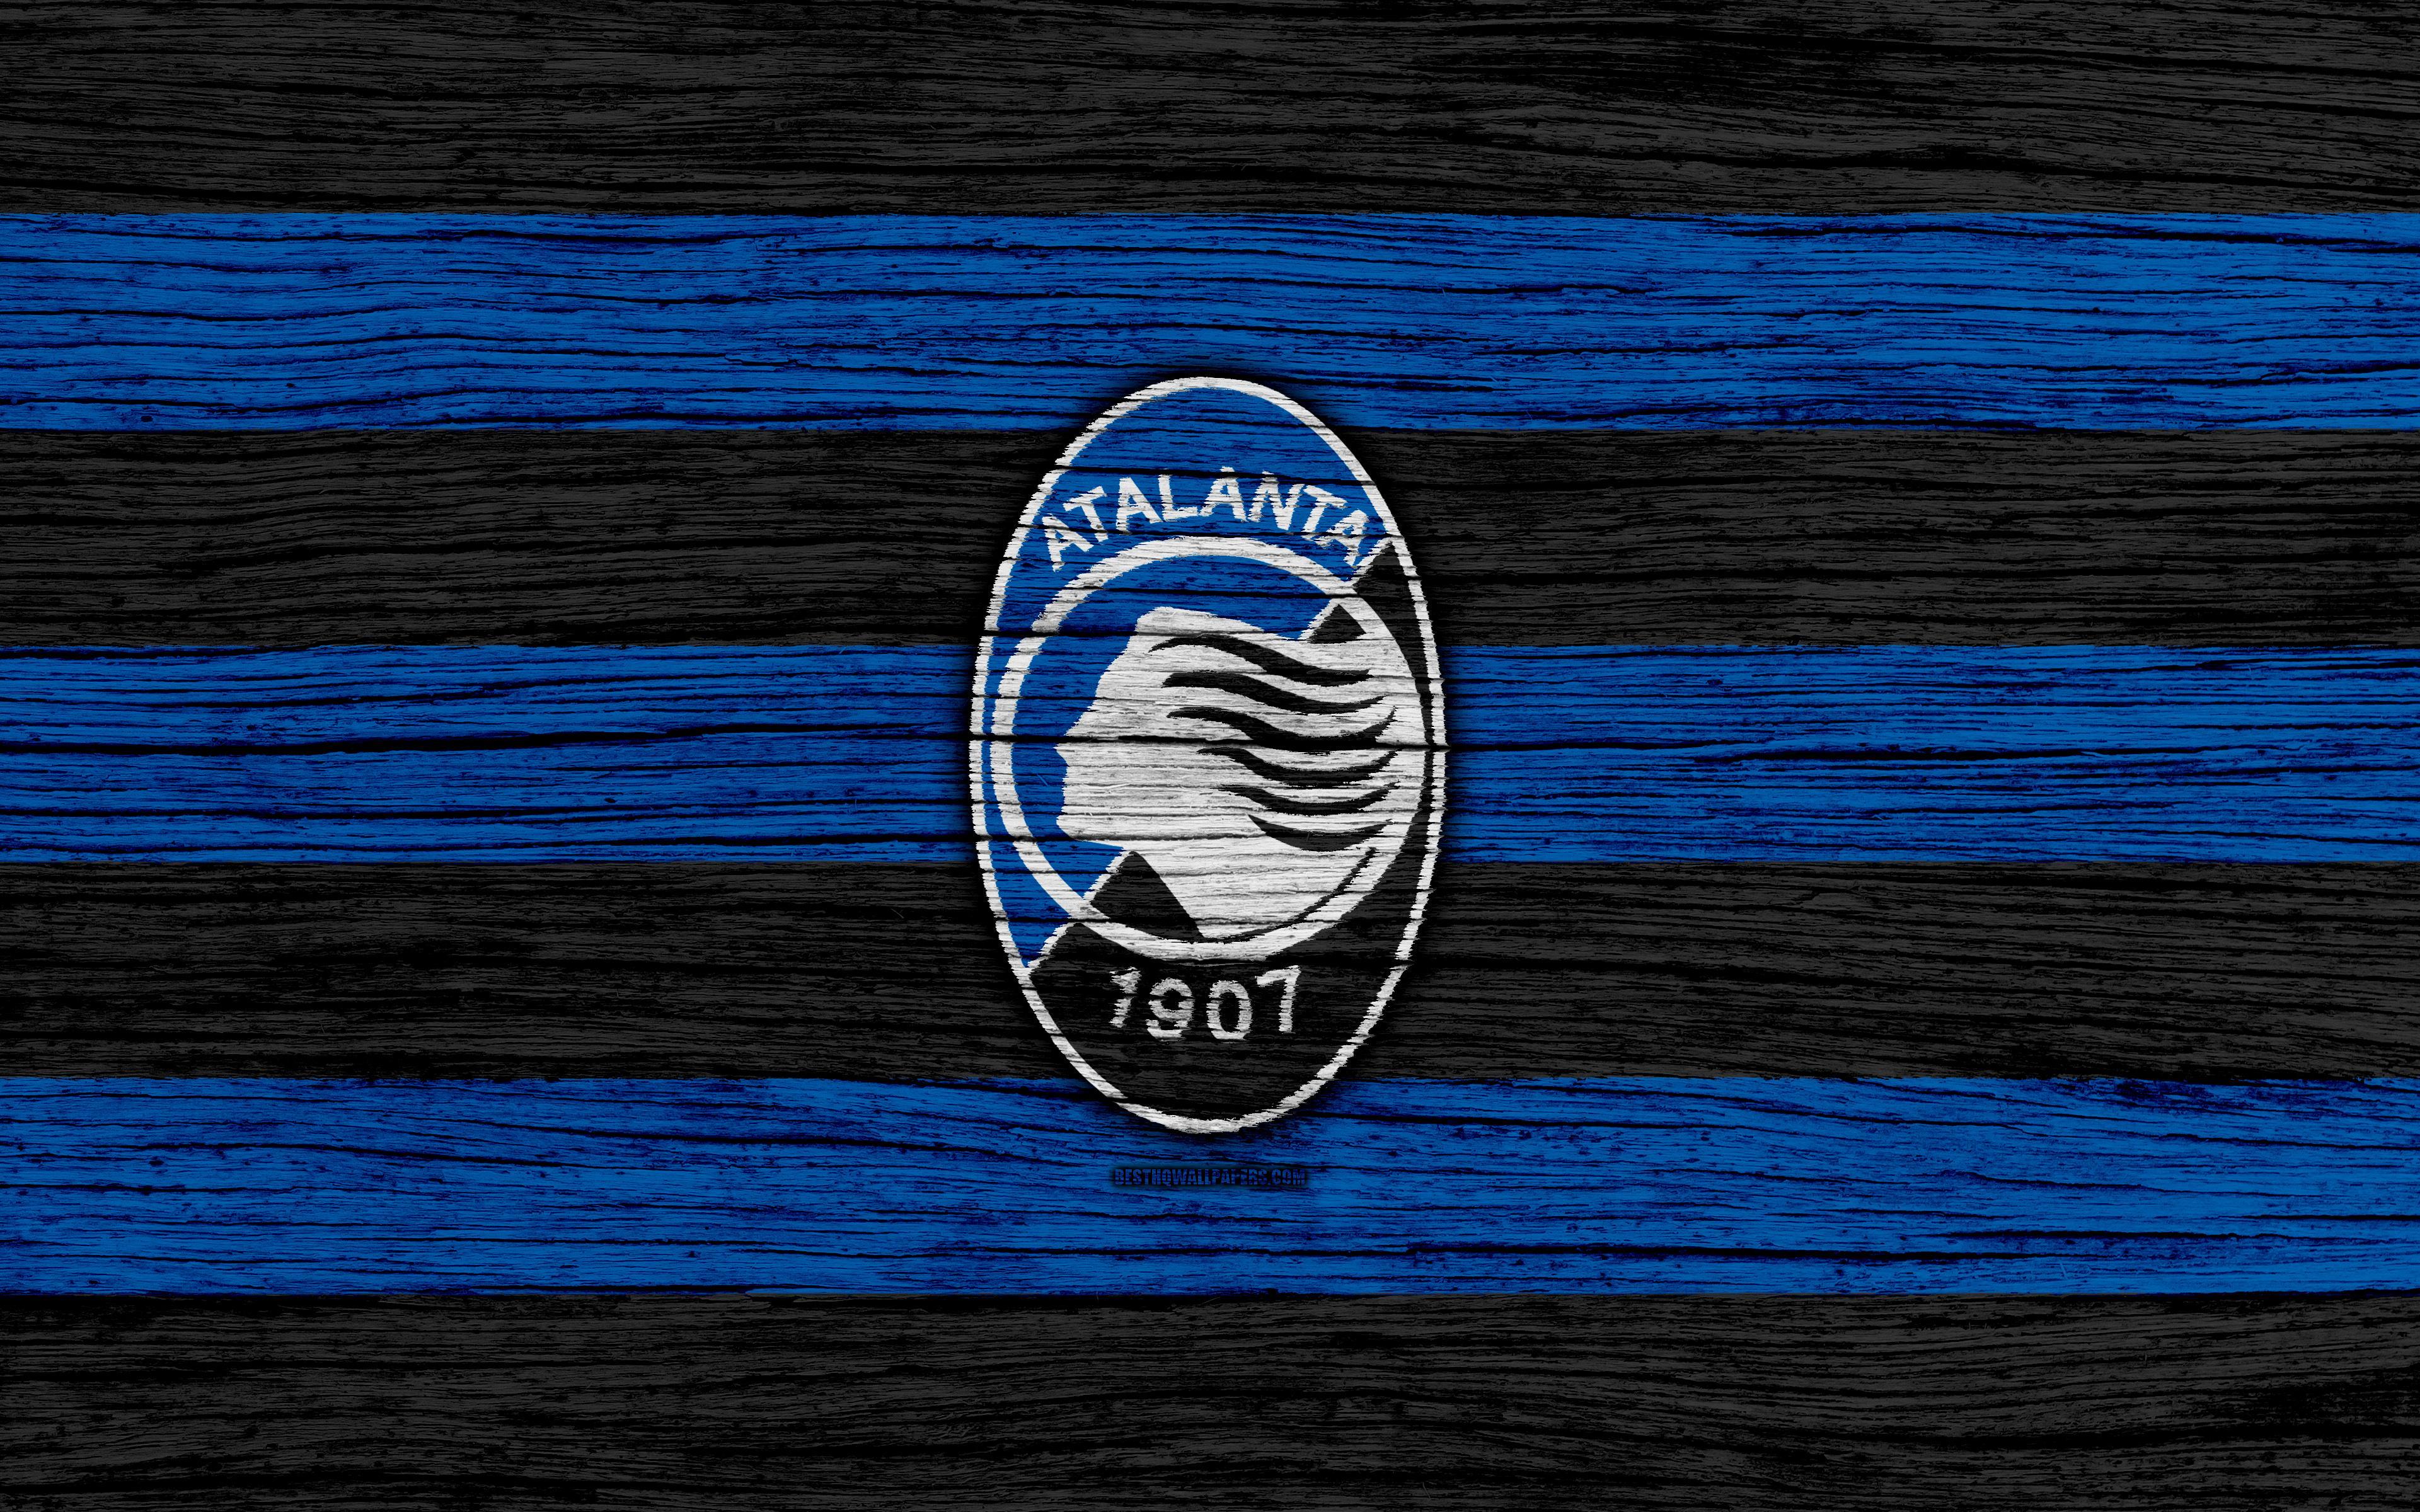 Download wallpapers Atalanta, 4k, Serie A, logo, Italy, wooden